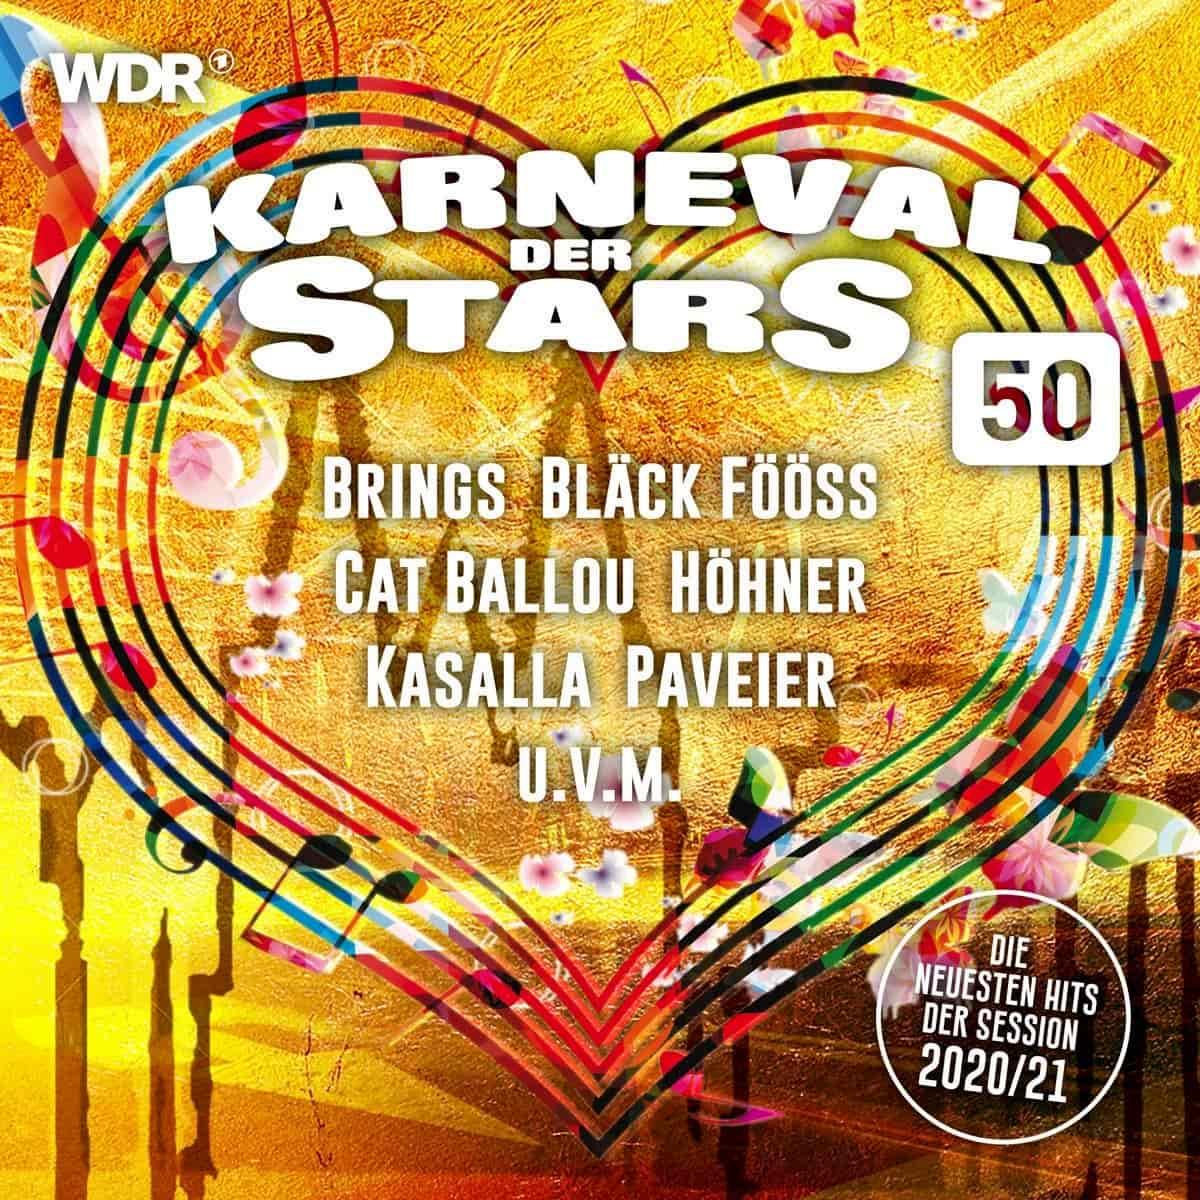 Karneval der Stars 50 - Karnevals-CD 2020-2021